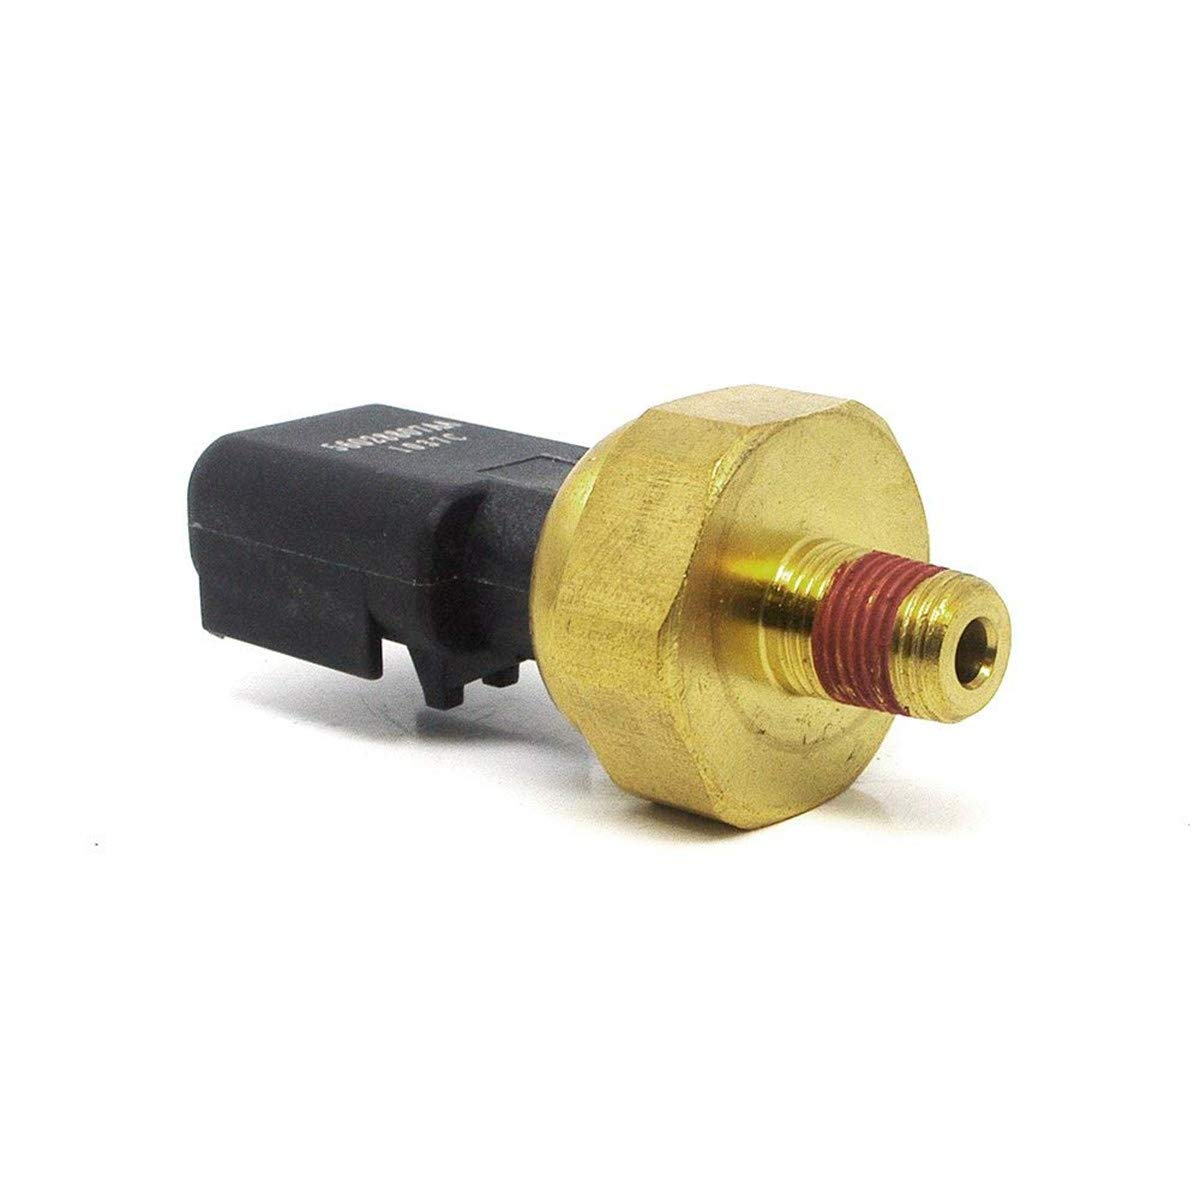 Triumilynn 56028807AA Engine Oil Pressure Sensor Fits Dodge Chrysler Jeep Vehicles - 05149064AA HAOCHENGQIPEI